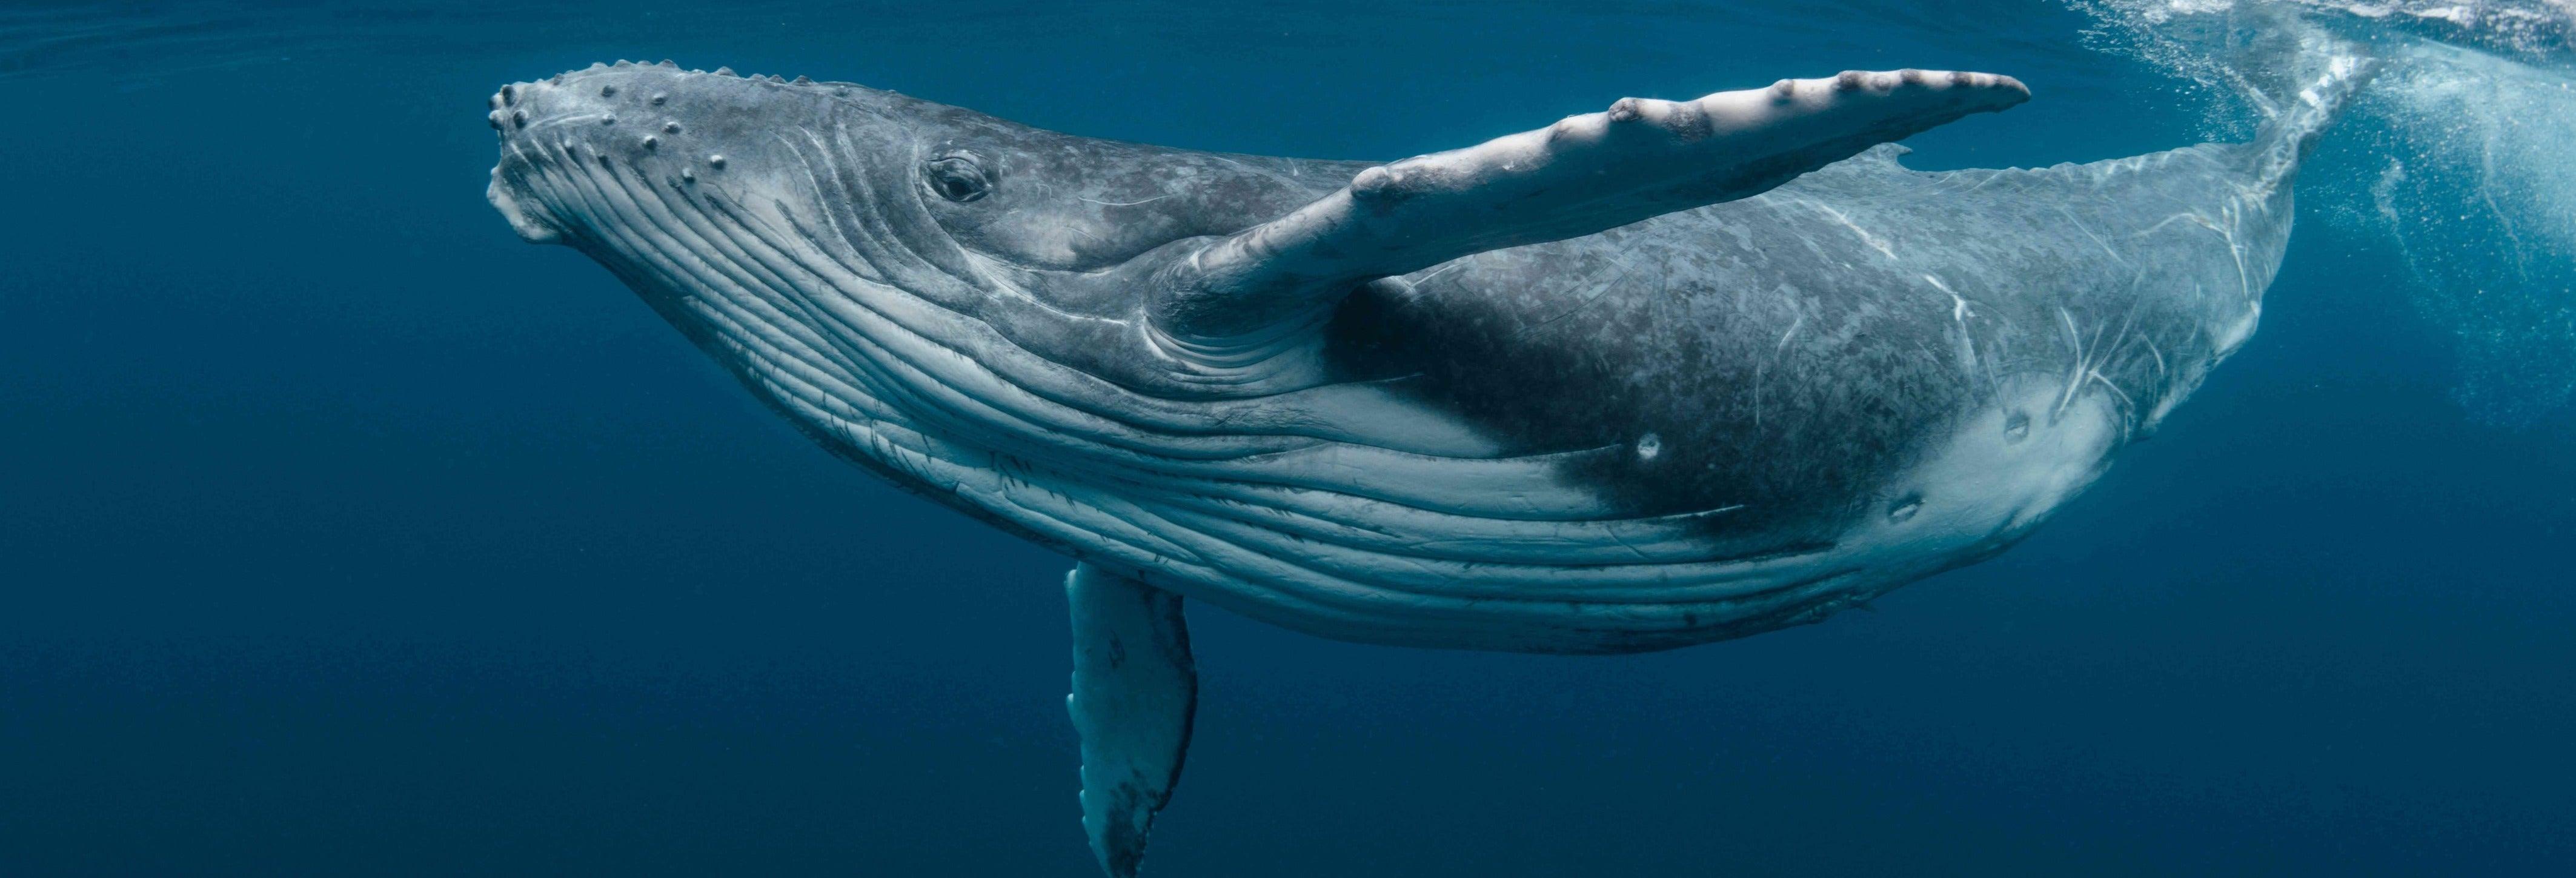 Avistamento de baleias na Riviera Nayarit